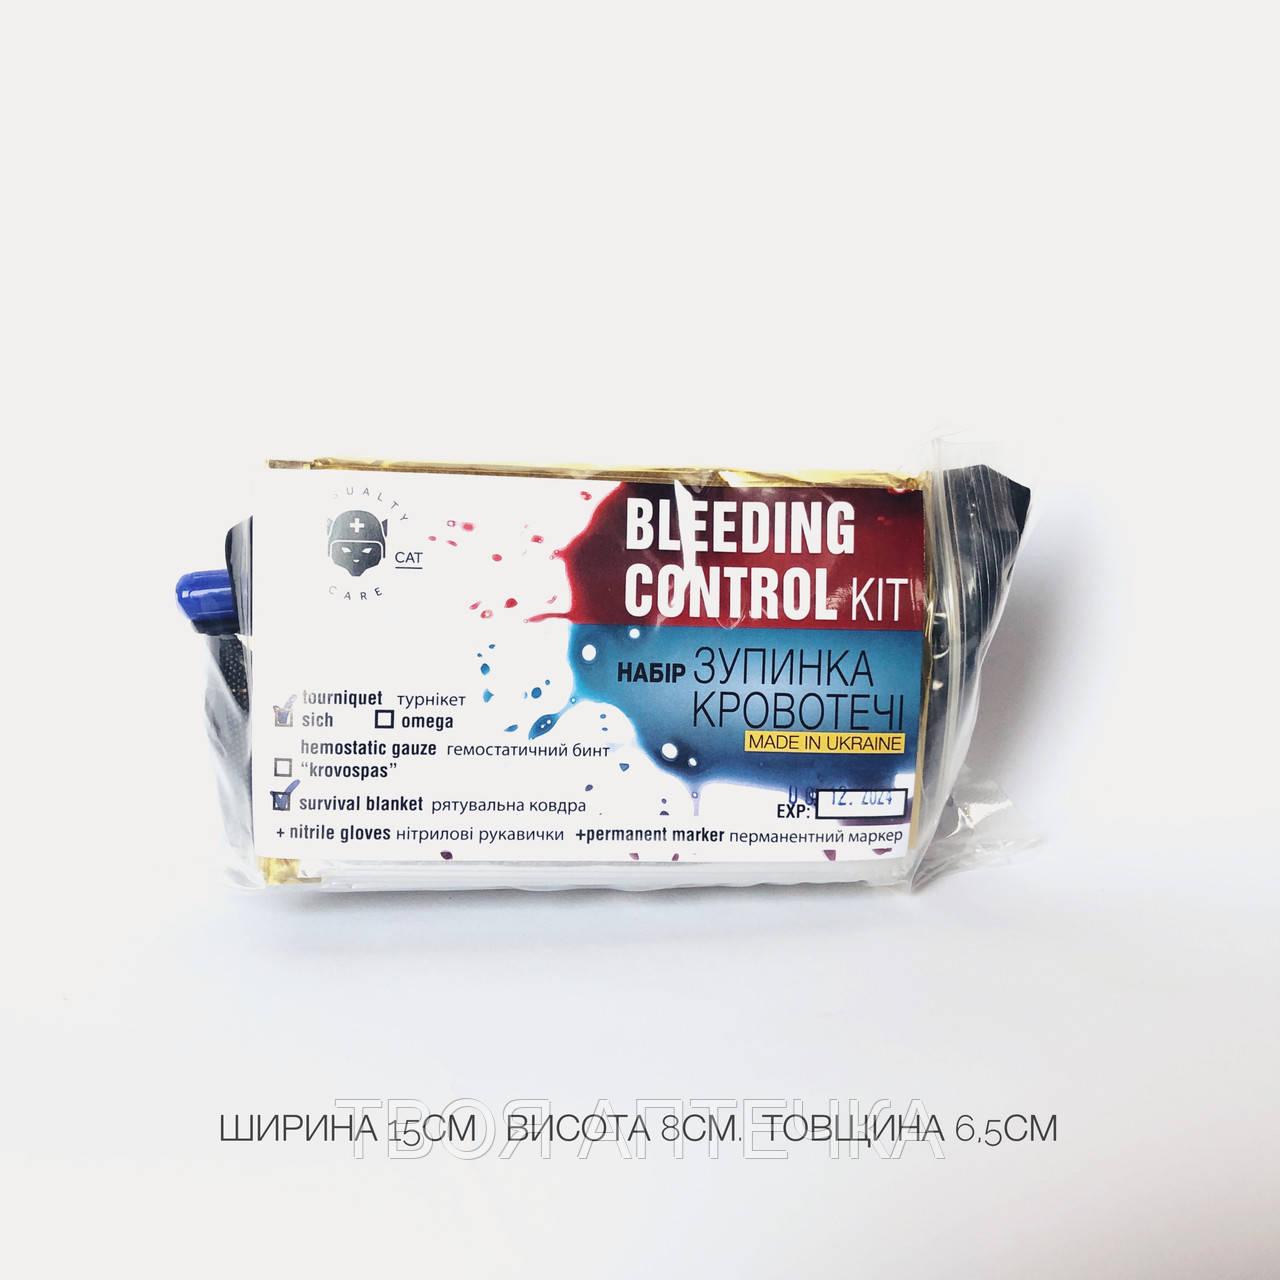 Bleeding control kit SICH 2.0 / Турнікет+термоковдра